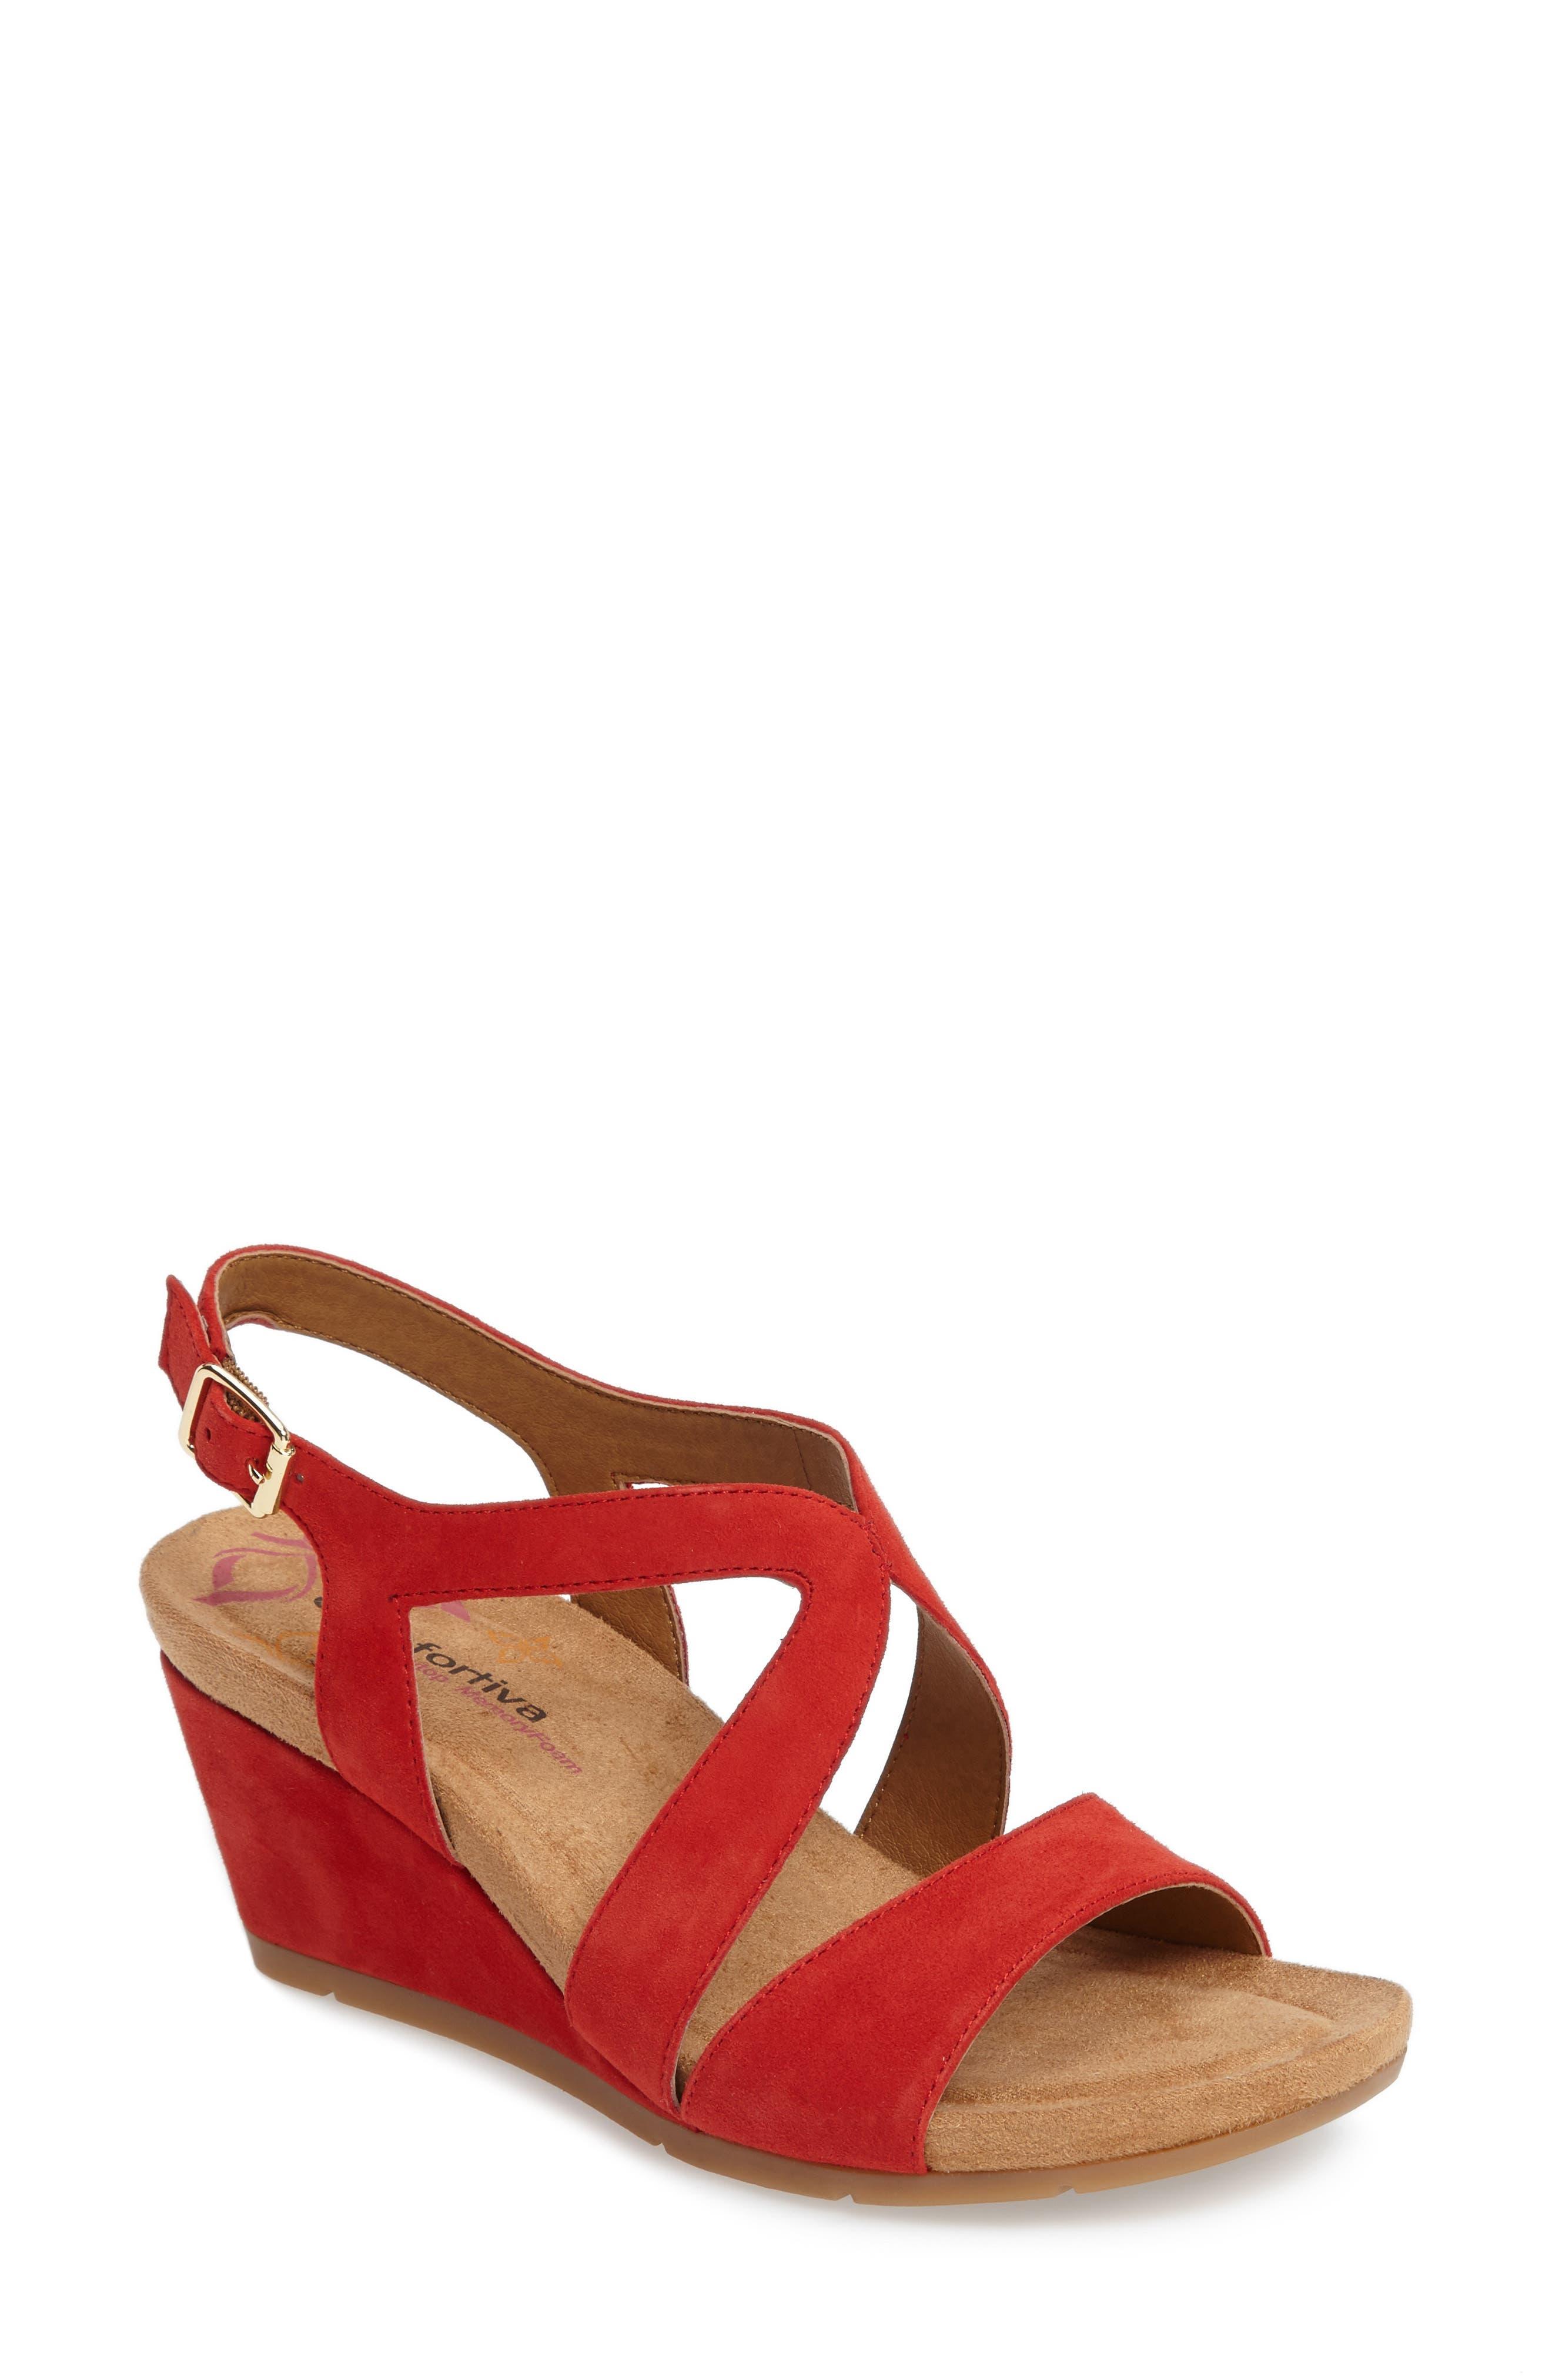 Alternate Image 1 Selected - Comfortiva Vandy Sandal (Women)